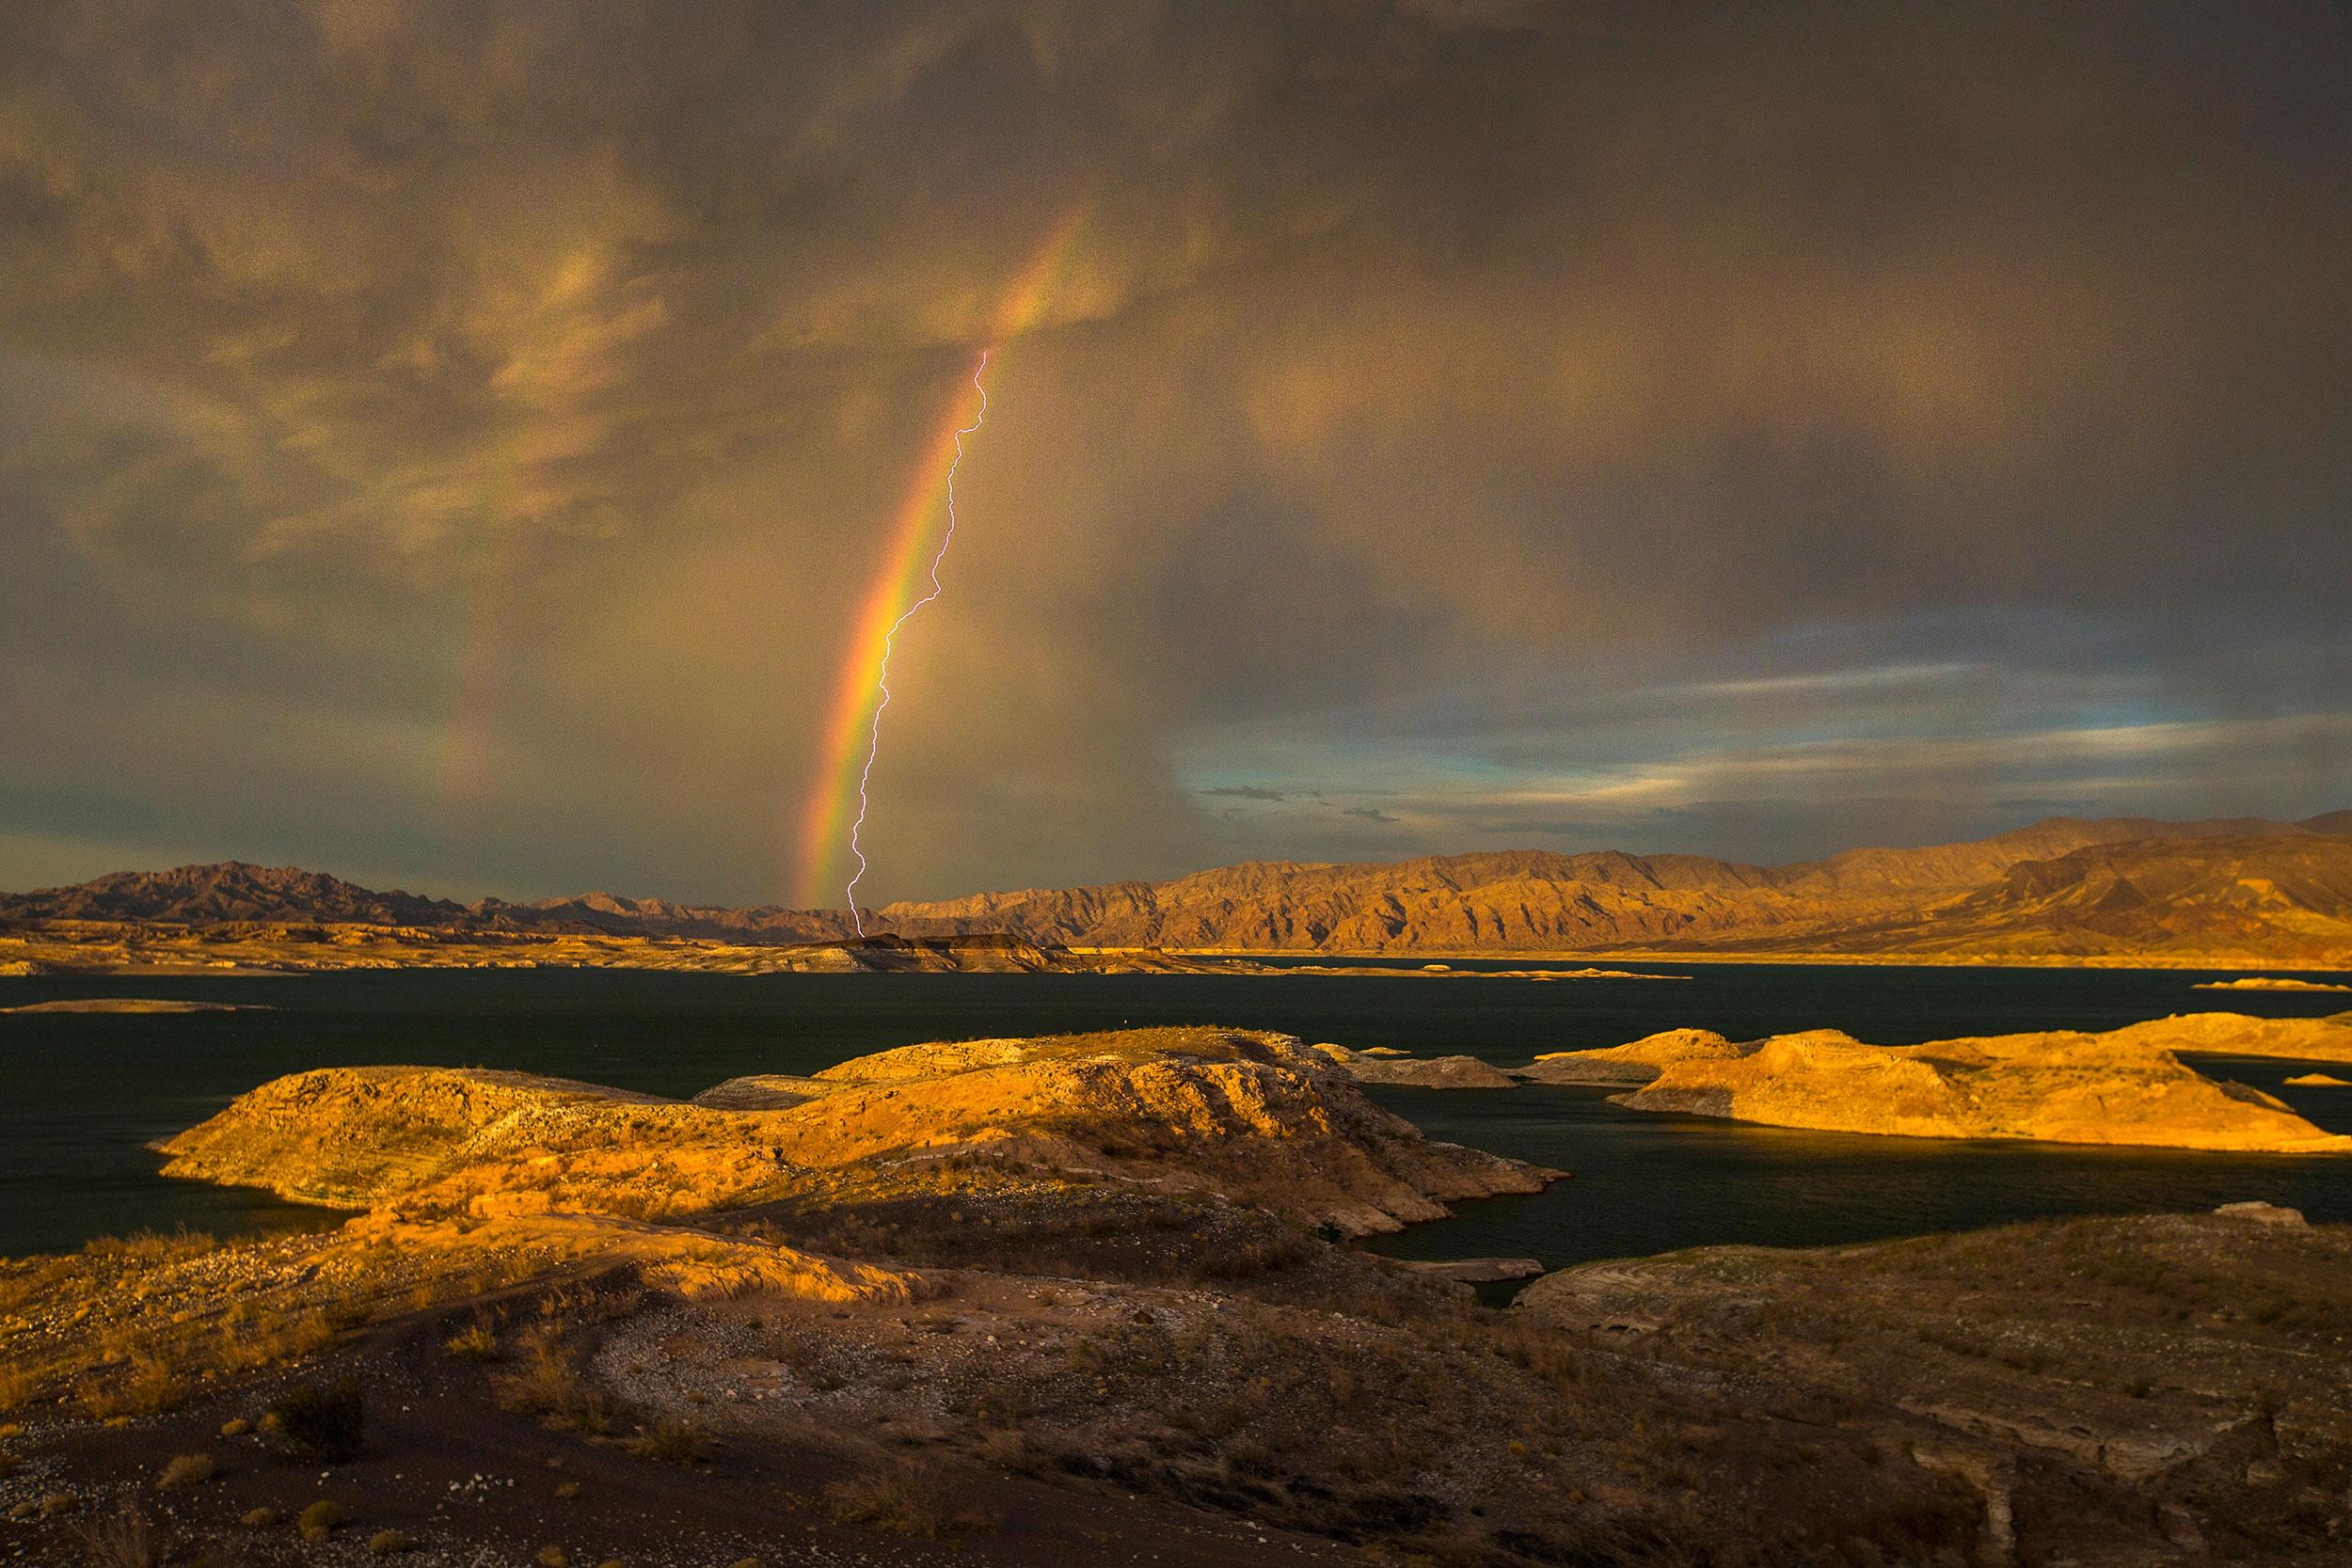 Lightning strikes near a rainbow over Lake Mead National Recreation Area Lake Mead, Nevada on July 1, 2015.